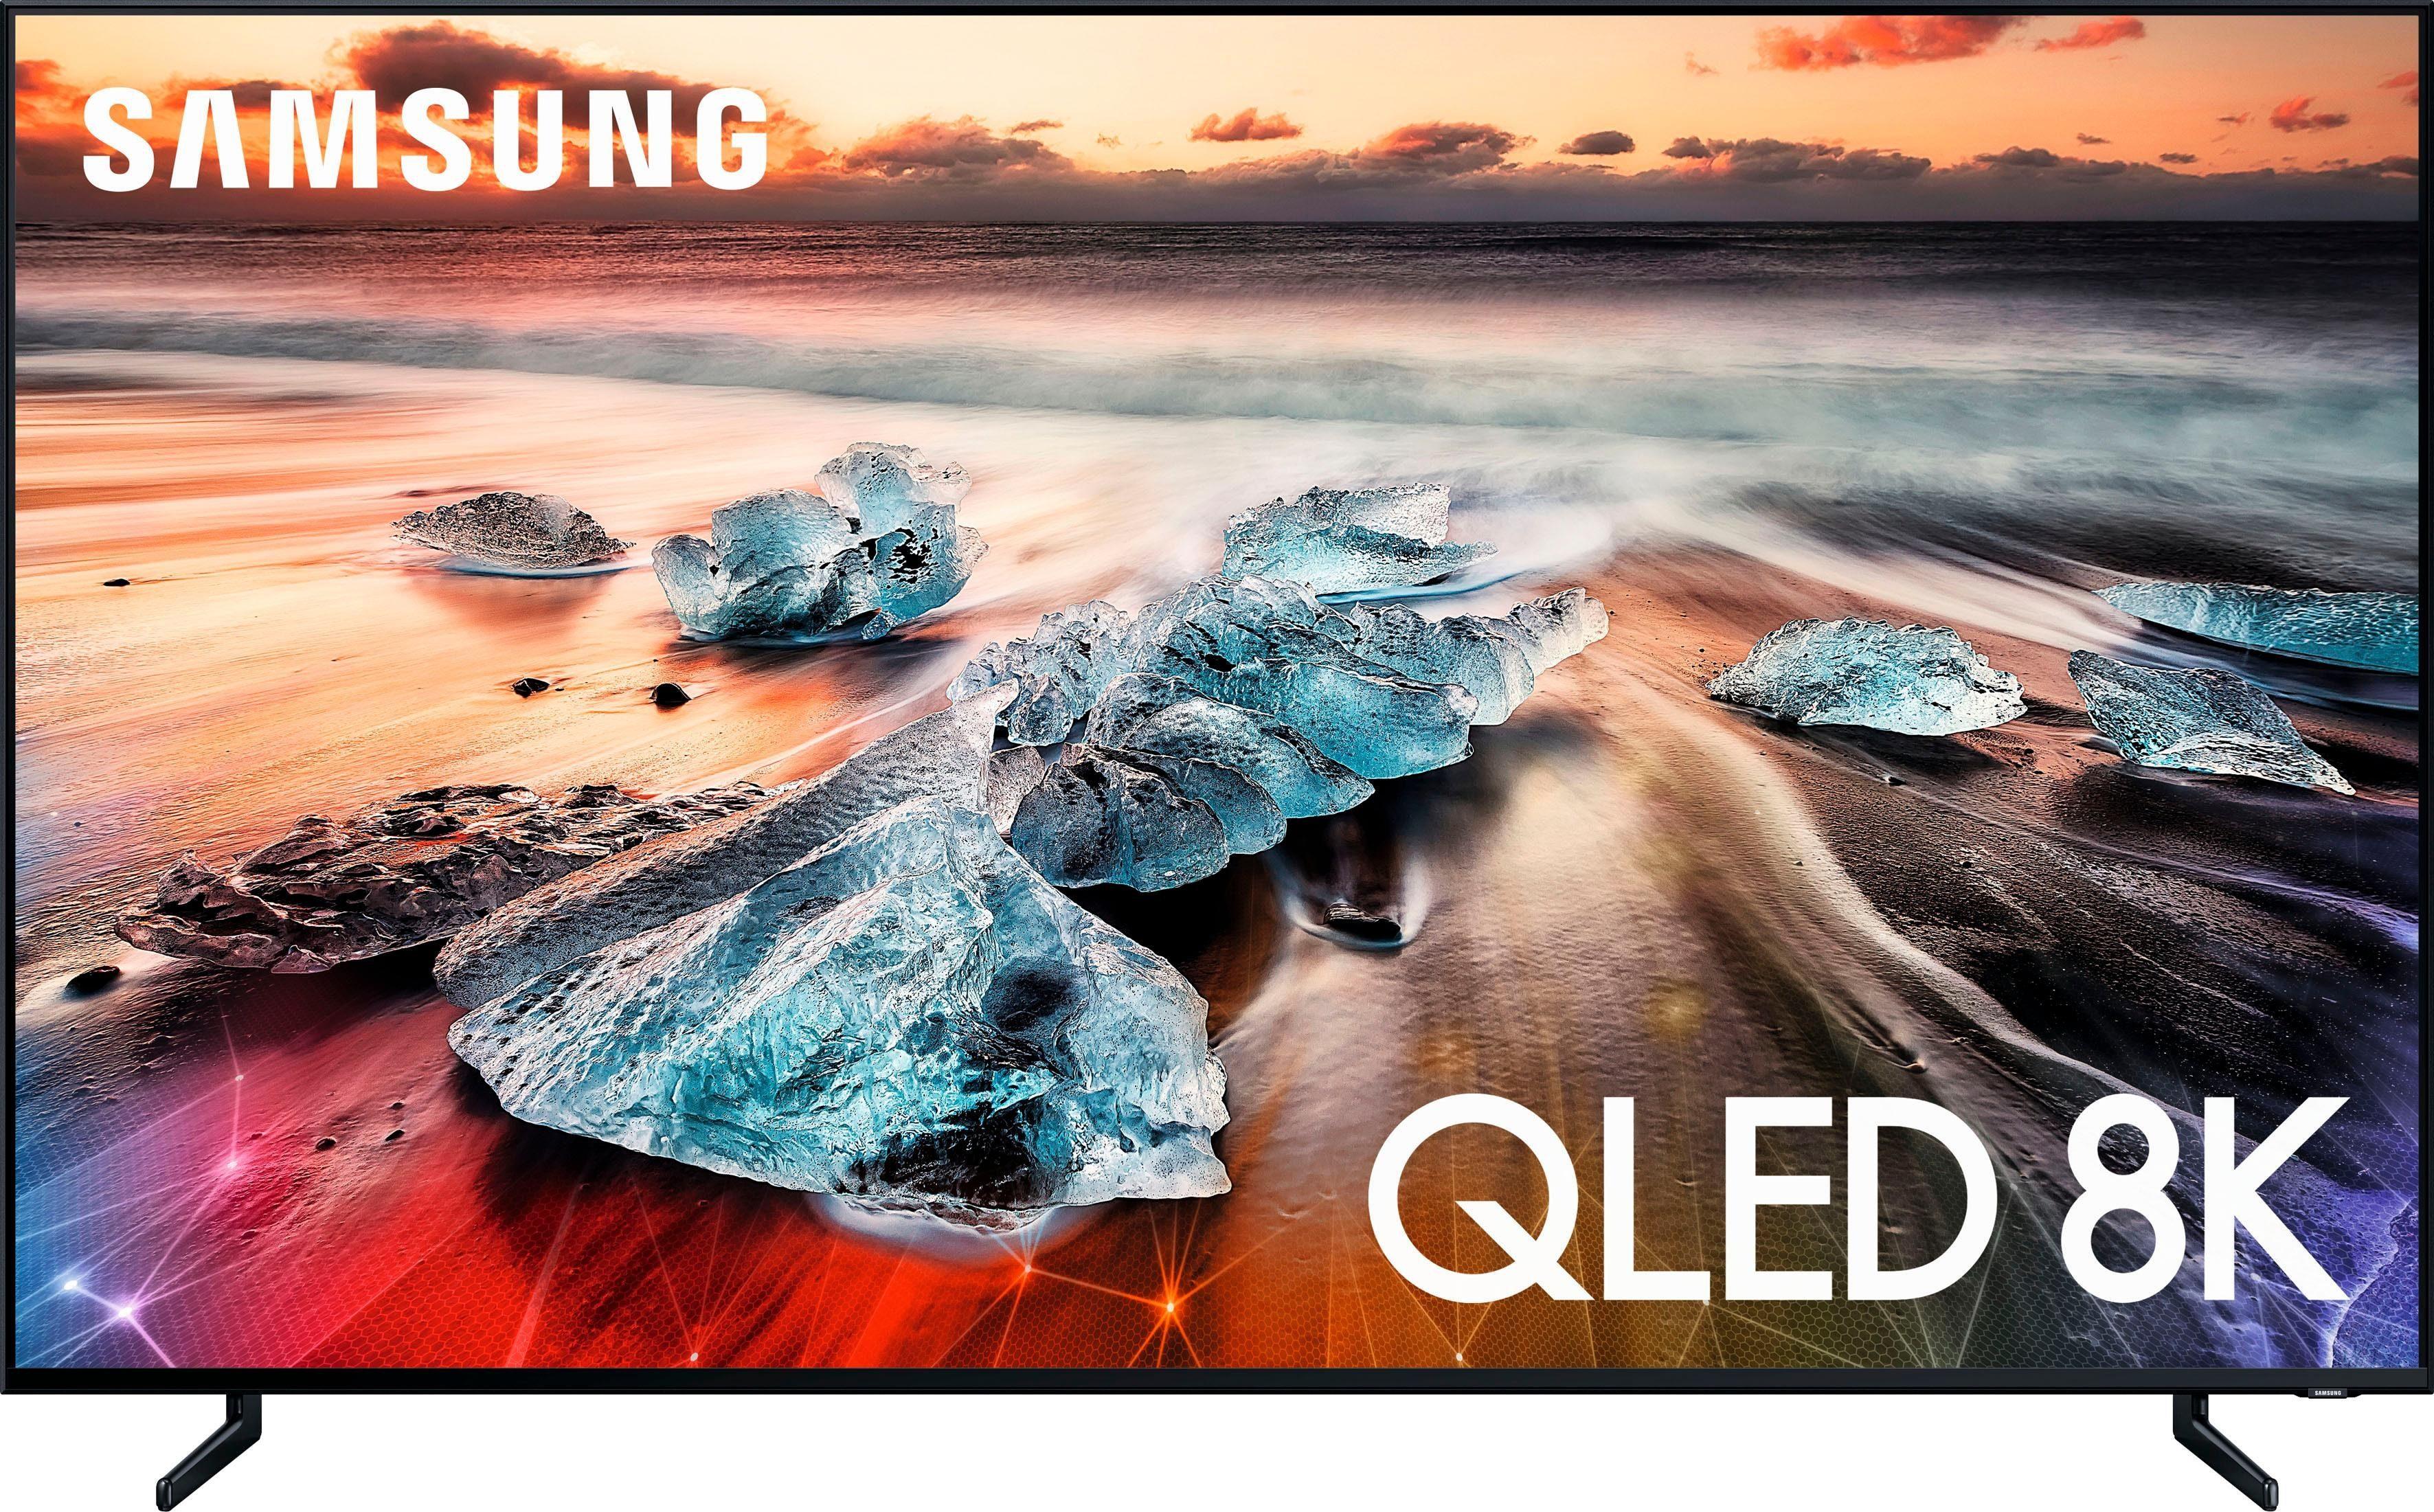 Samsung GQ65Q950R QLED-Fernseher (163 cm/65 Zoll, 8K, Smart-TV)